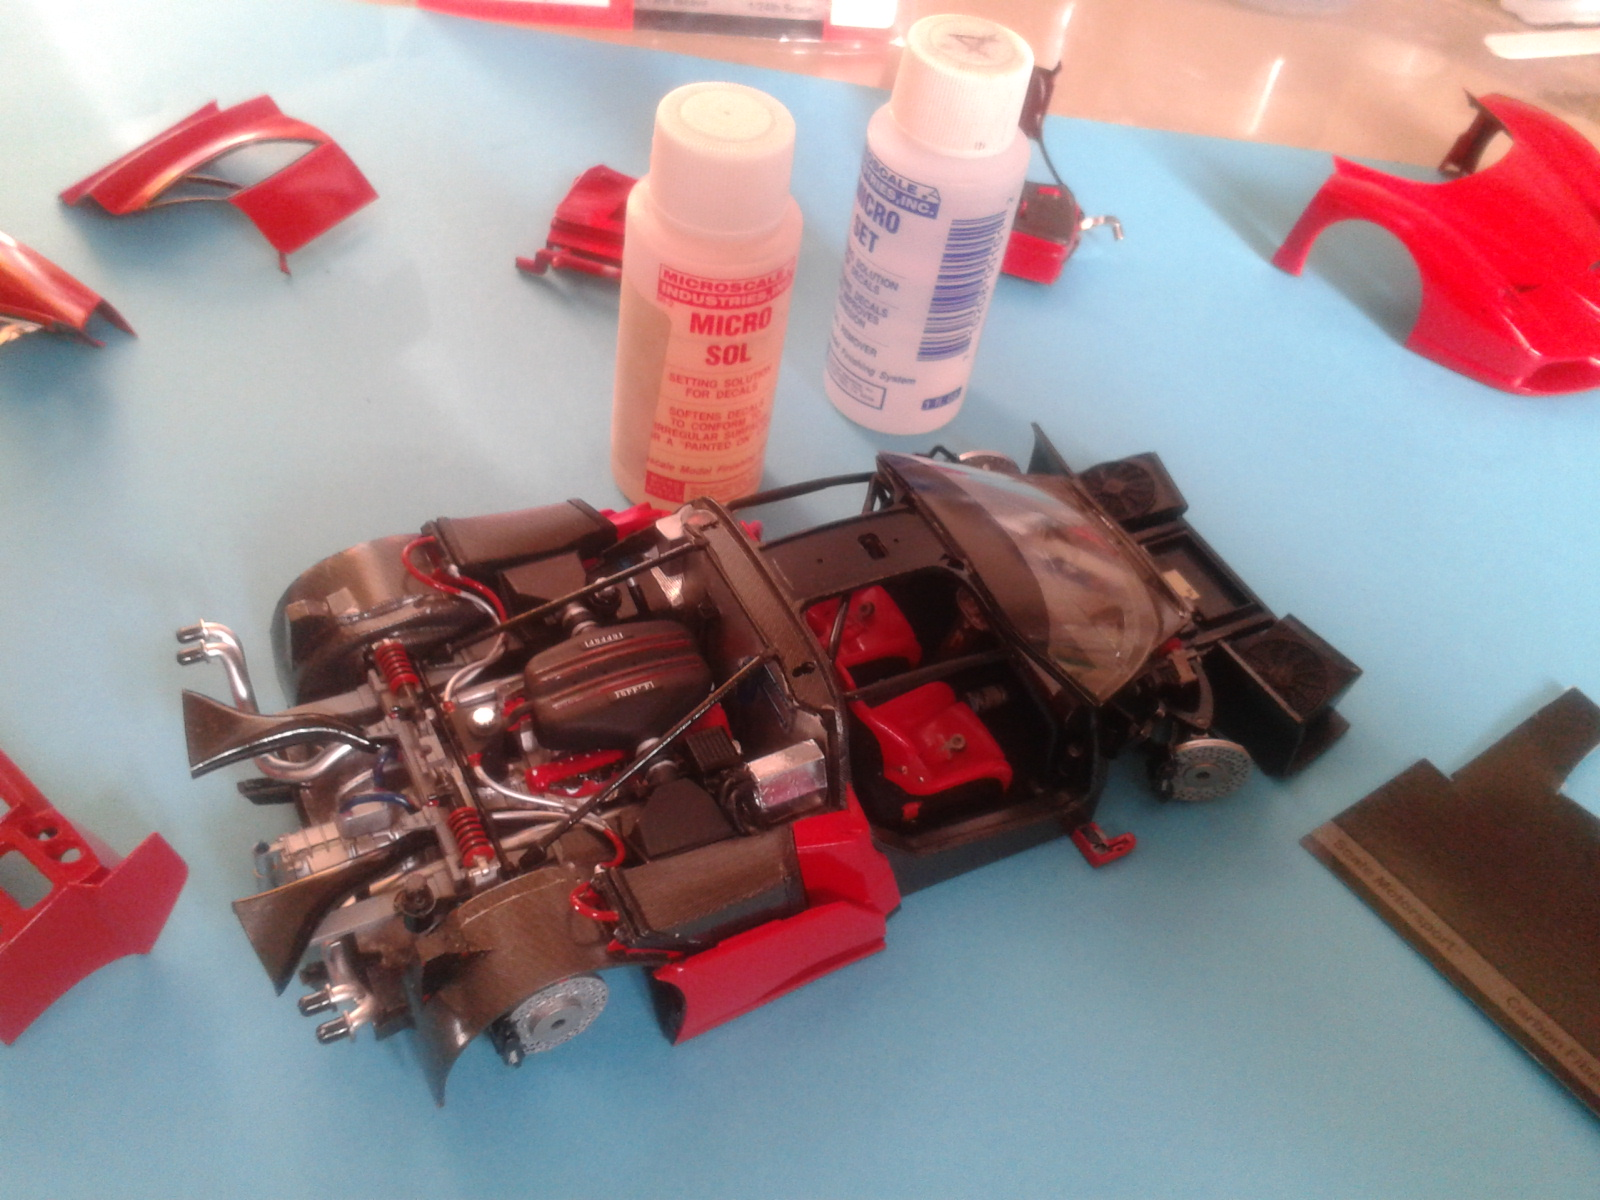 Ferrari FXX ...Tamiya 1/24... Reprise du montage !!!!!! 20130403183657